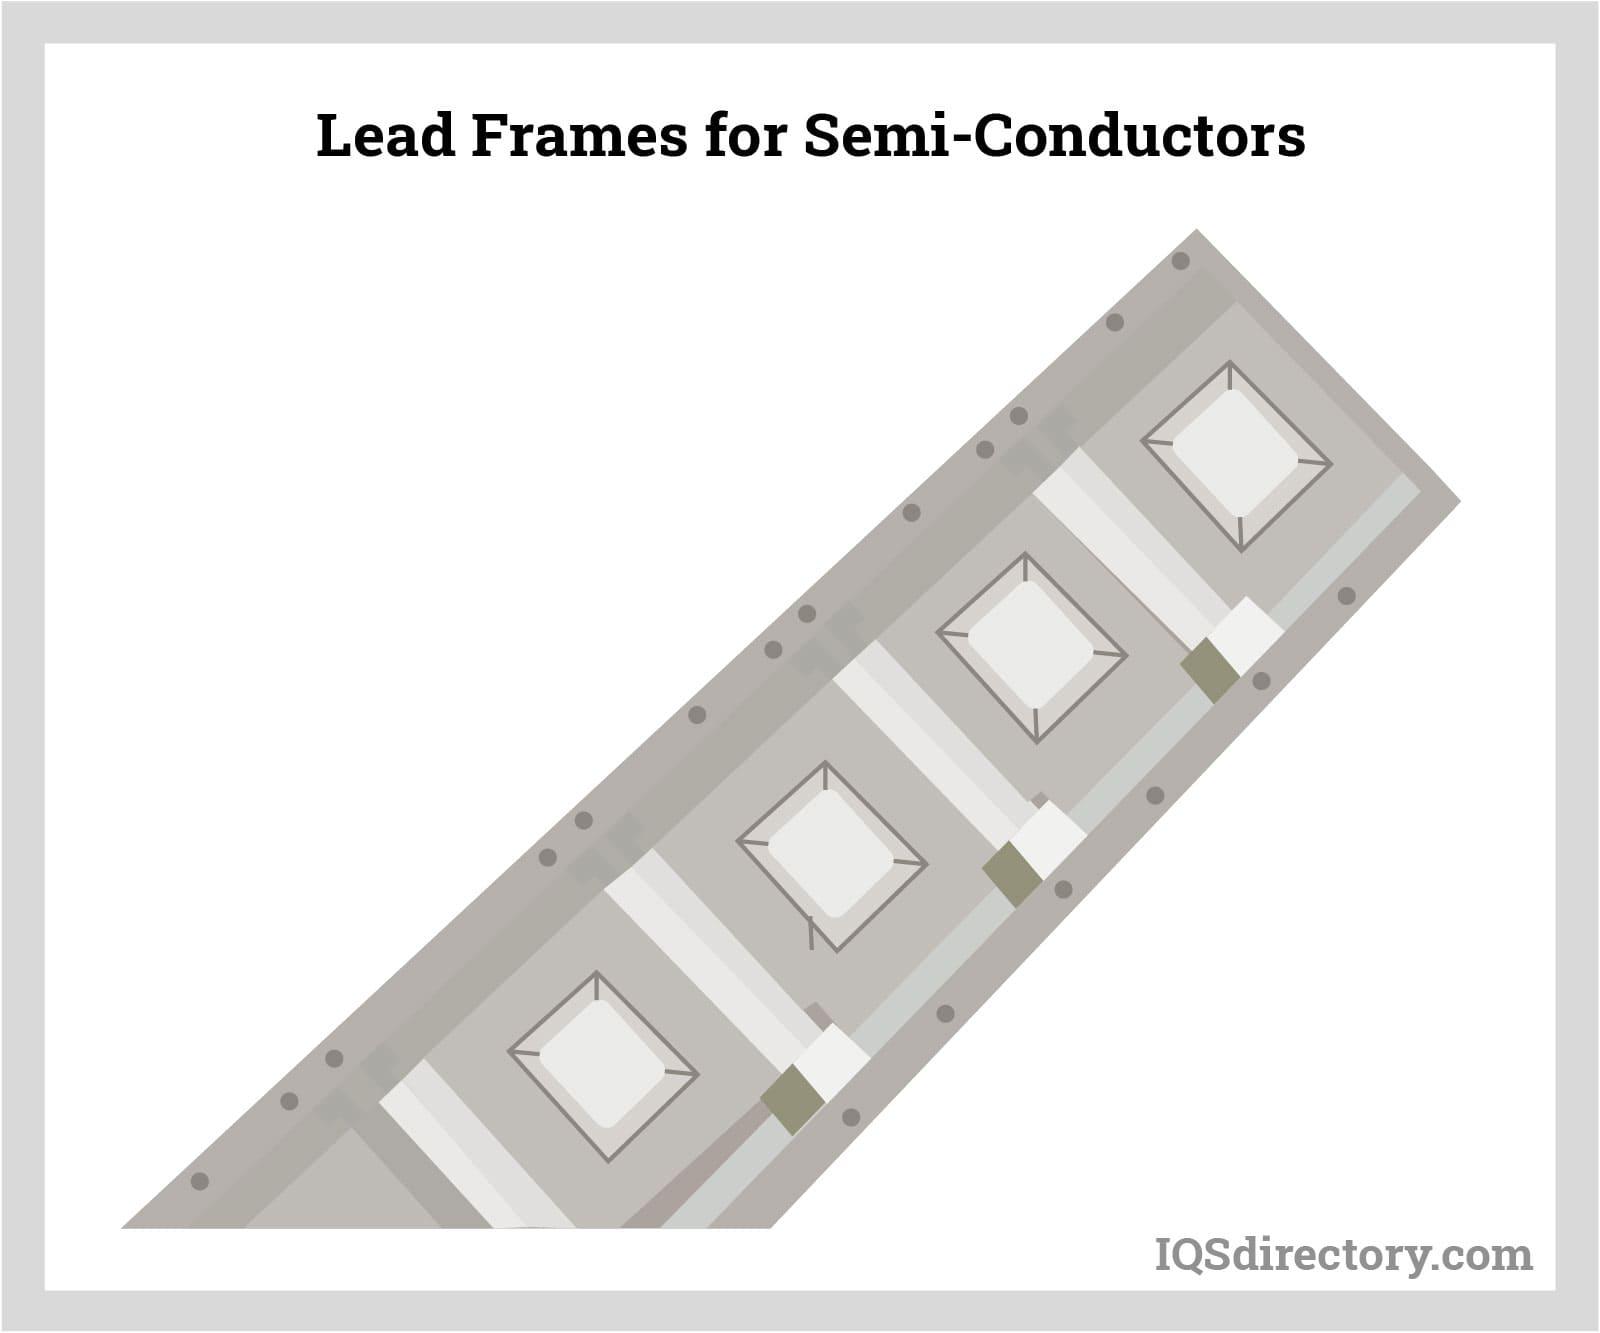 Lead Frames for Semi-Conductors